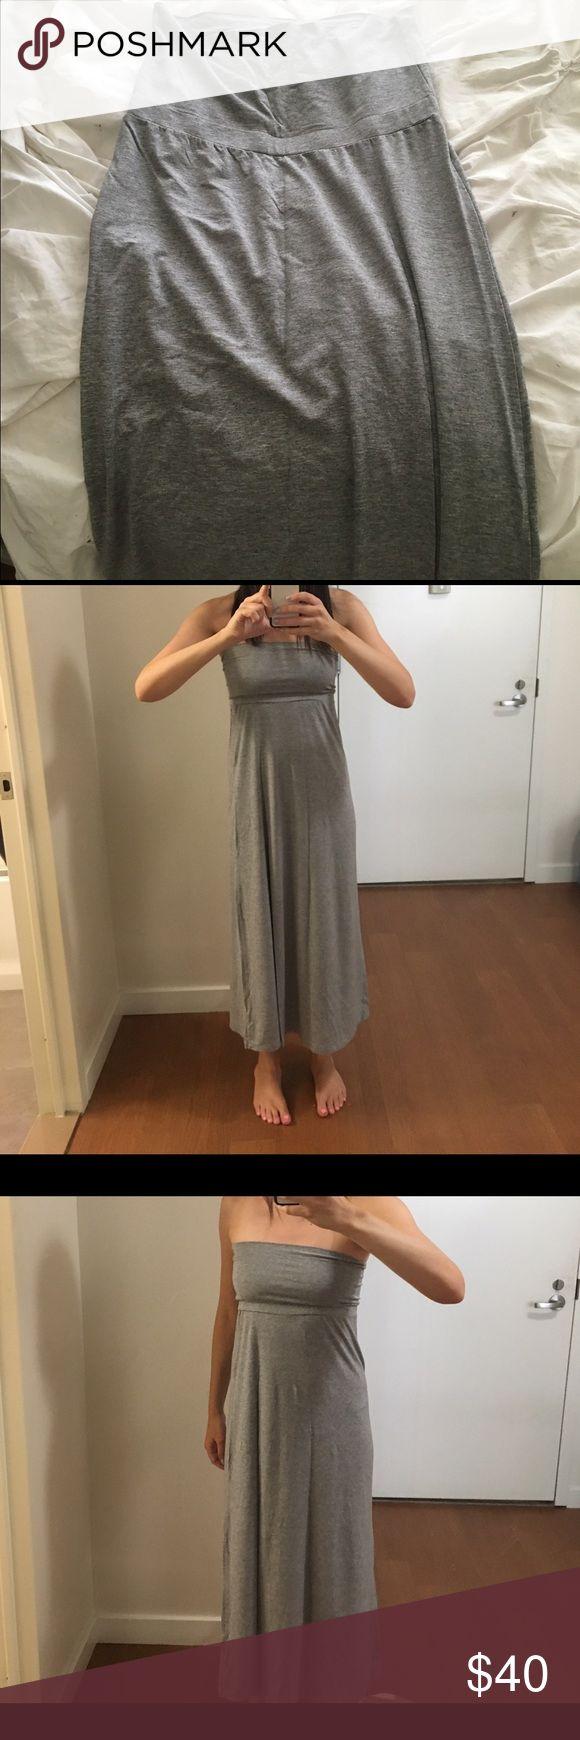 Splendid grey maxi dress/maxi skirt Splendid grey maxi dress can also be worn just as a maxi skirt - brand new never worn, tag attached Splendid Dresses Maxi